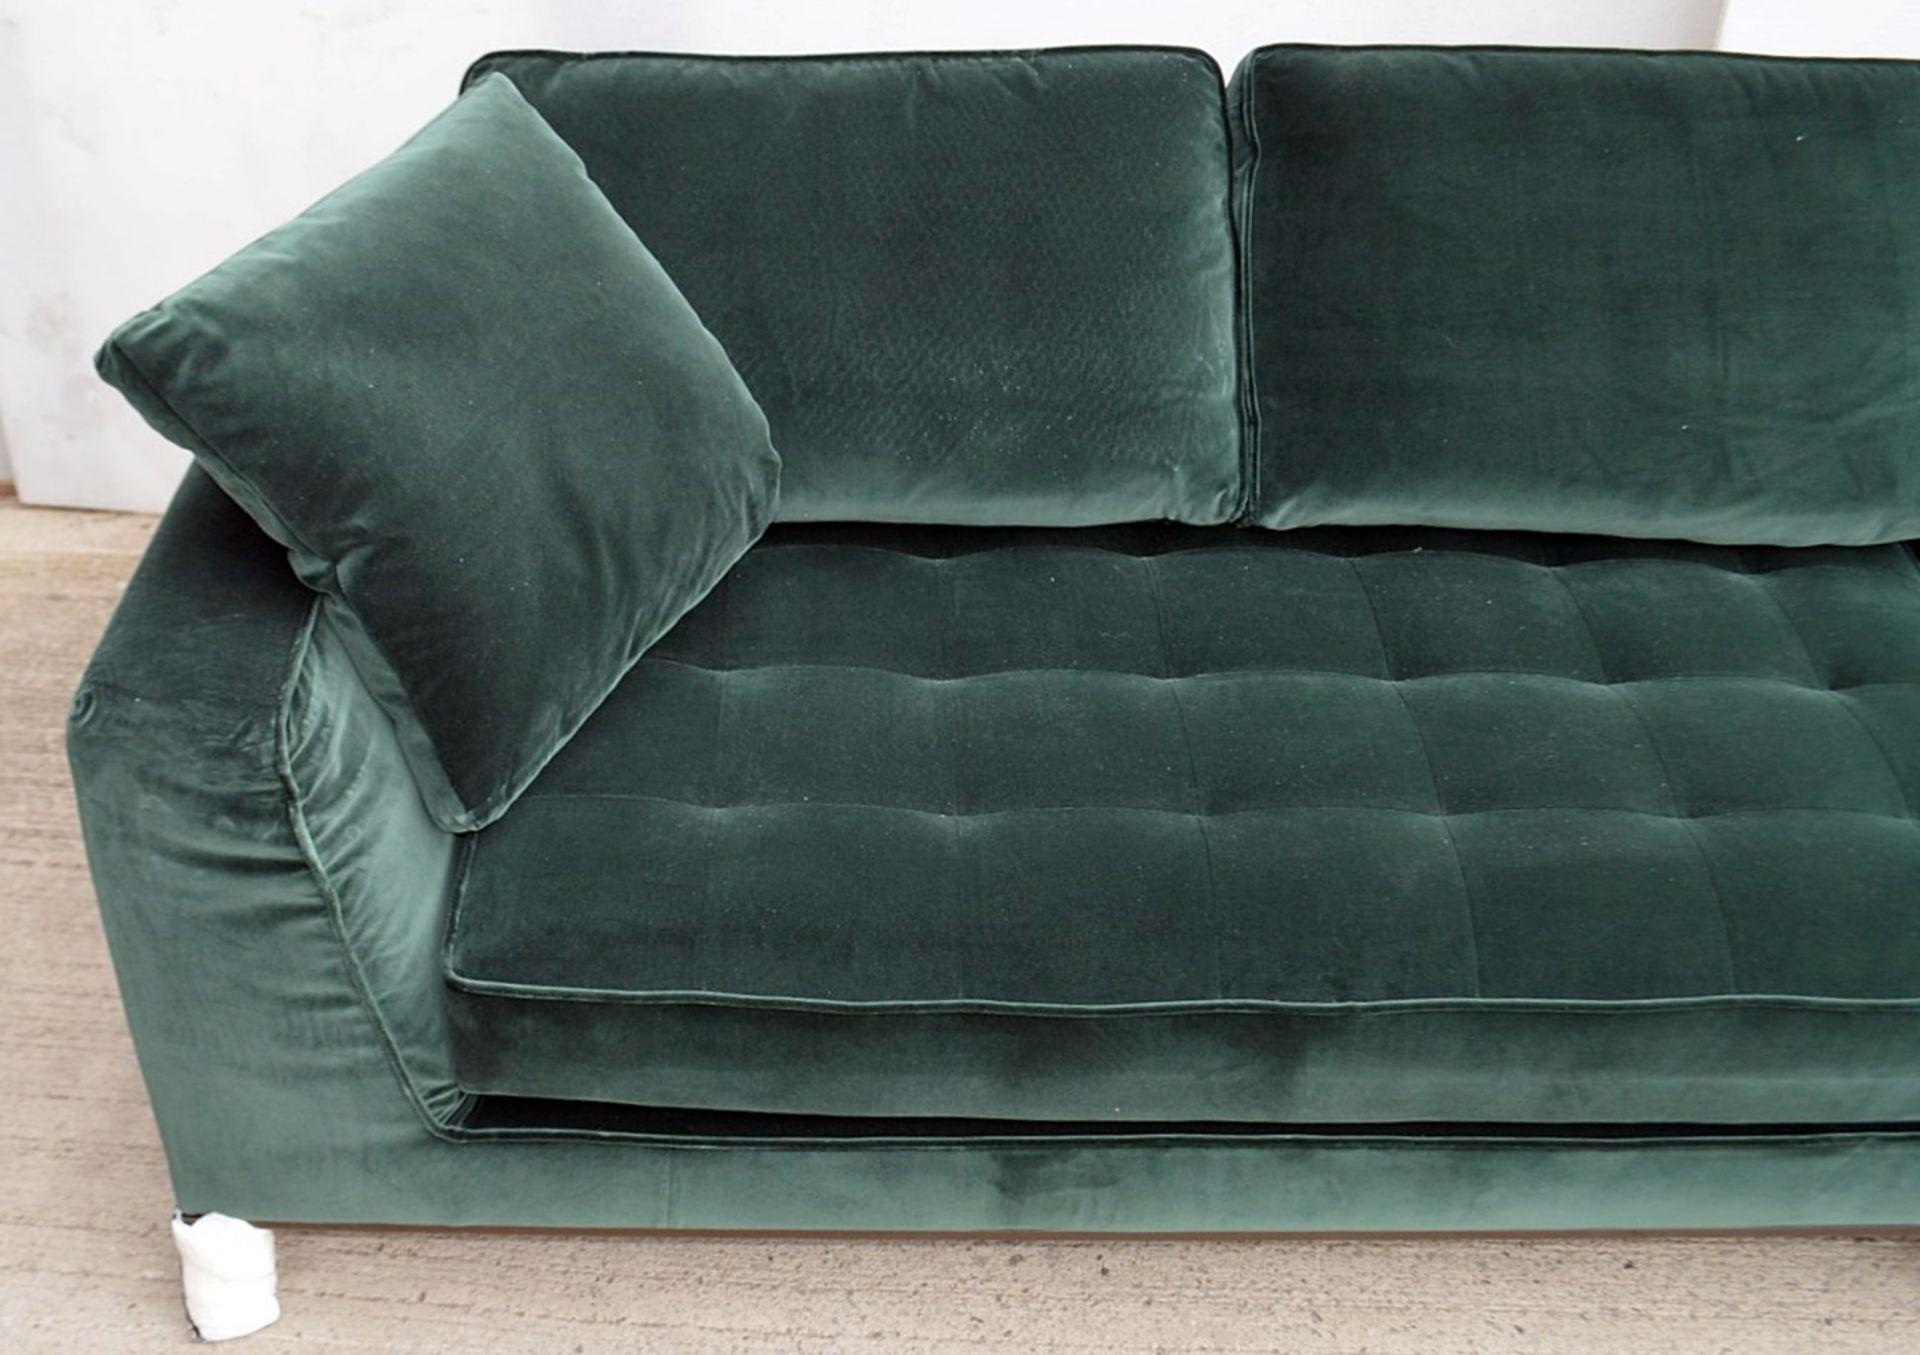 2 x B&B Italia MAXALTO Luxury Sofa Sections Both Upholstered In Rich Dark Green Velvet - RRP £7,248 - Image 8 of 13